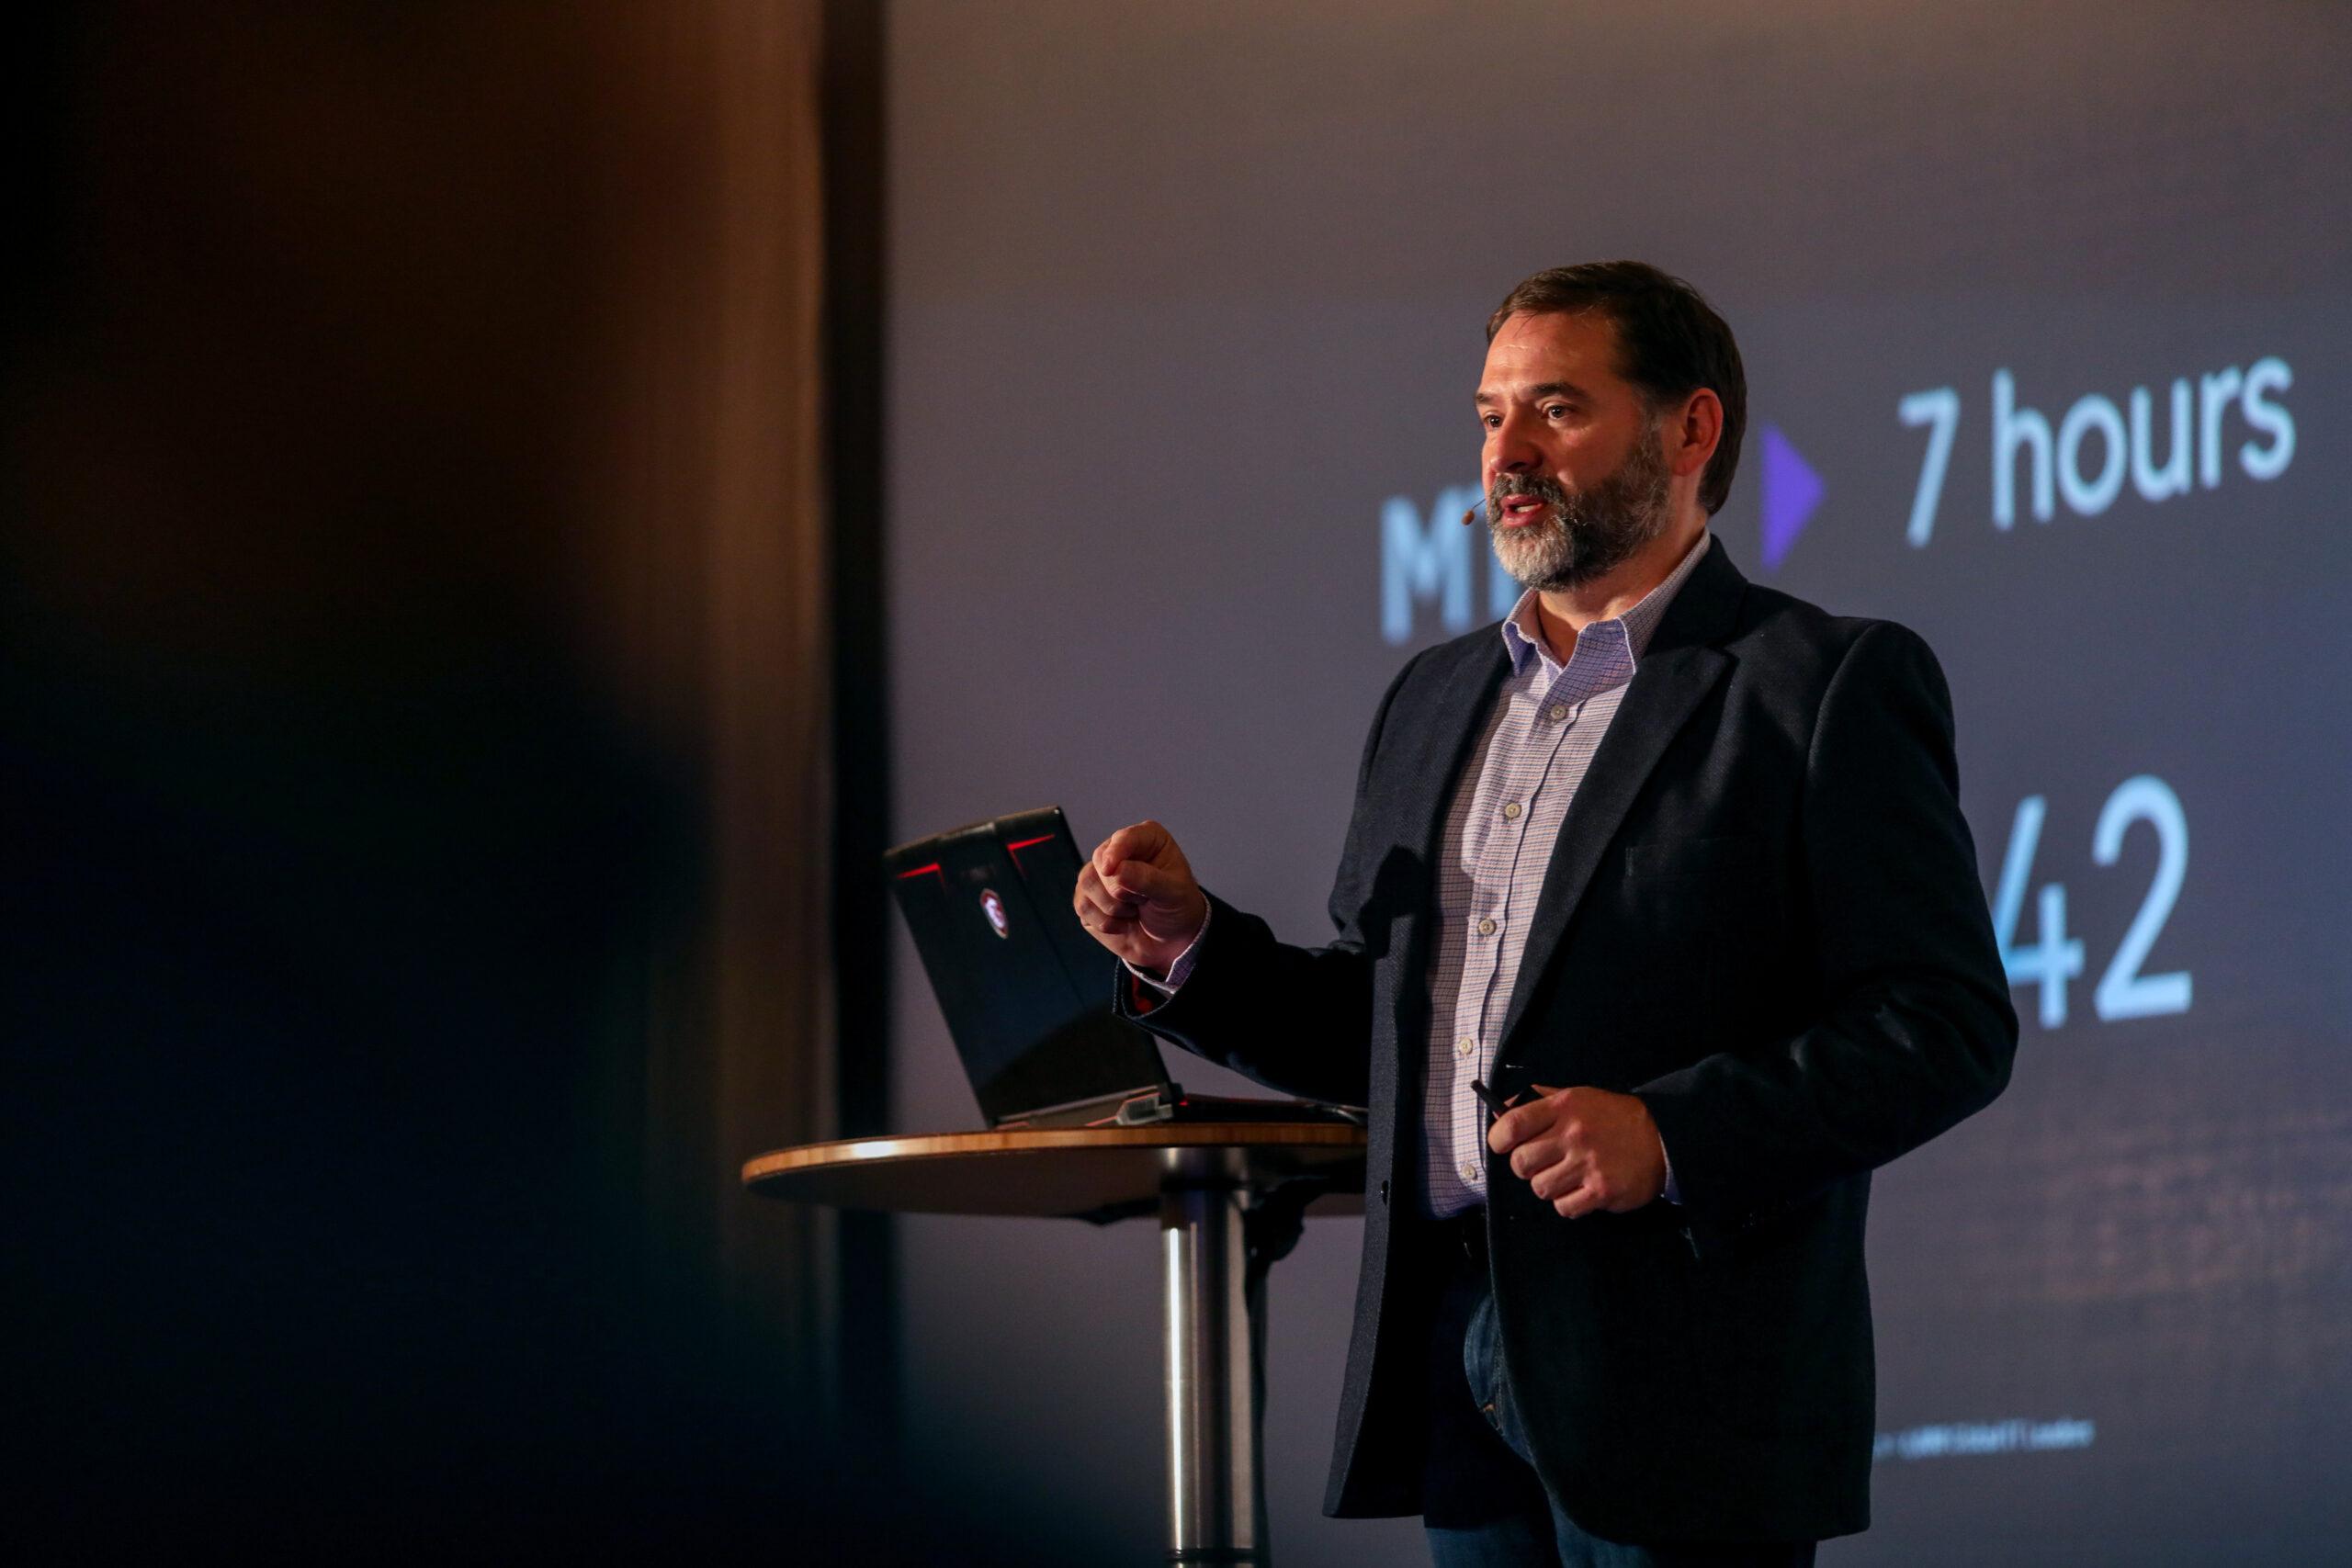 CTO Talk: Q&A with Cisco AppDynamics' Gregg Ostrowski